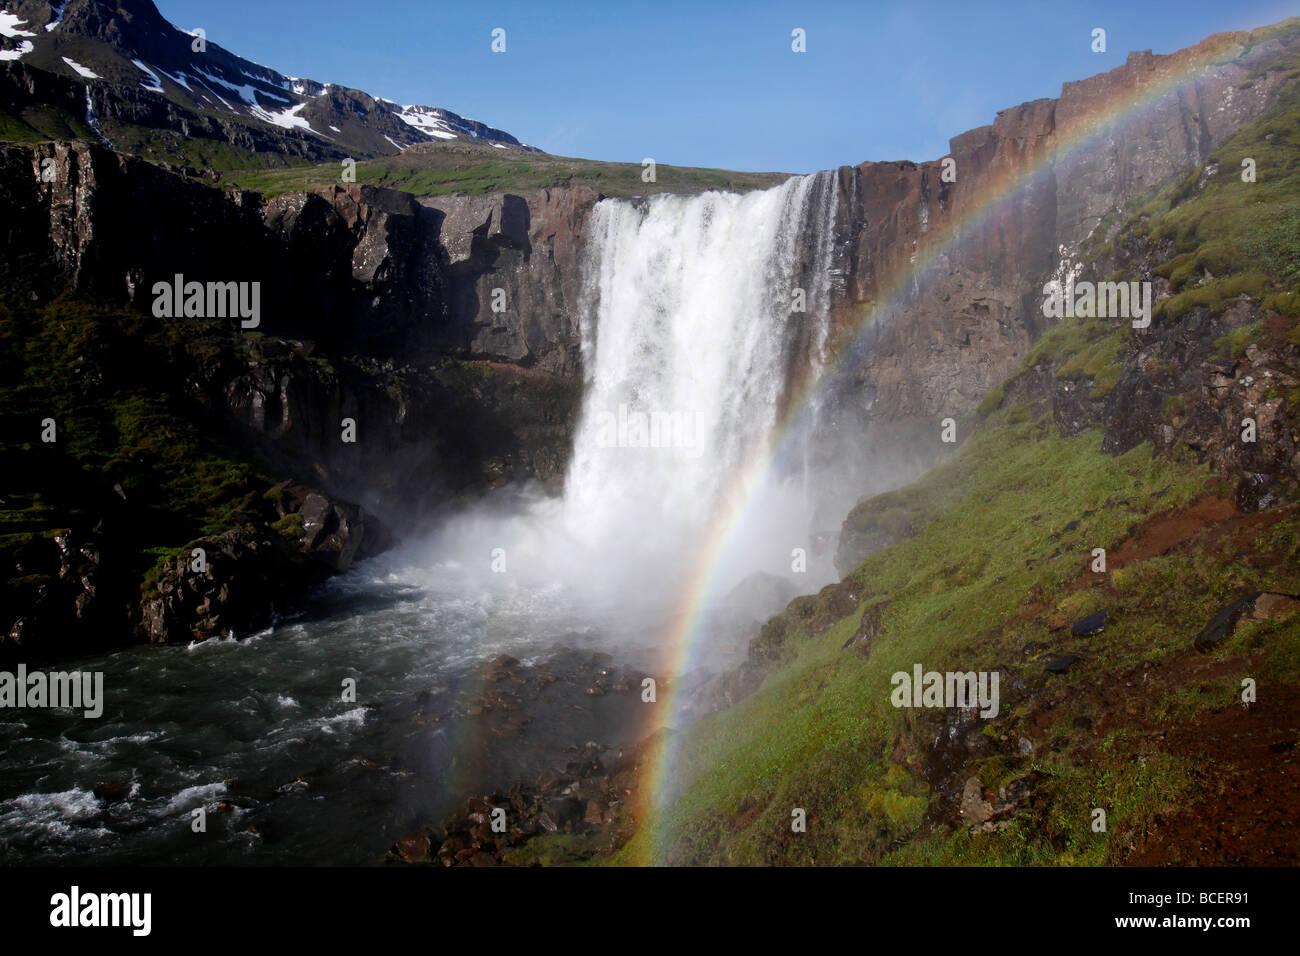 Waterfall rainbow, Seyðisfjörður, Iceland - Stock Image